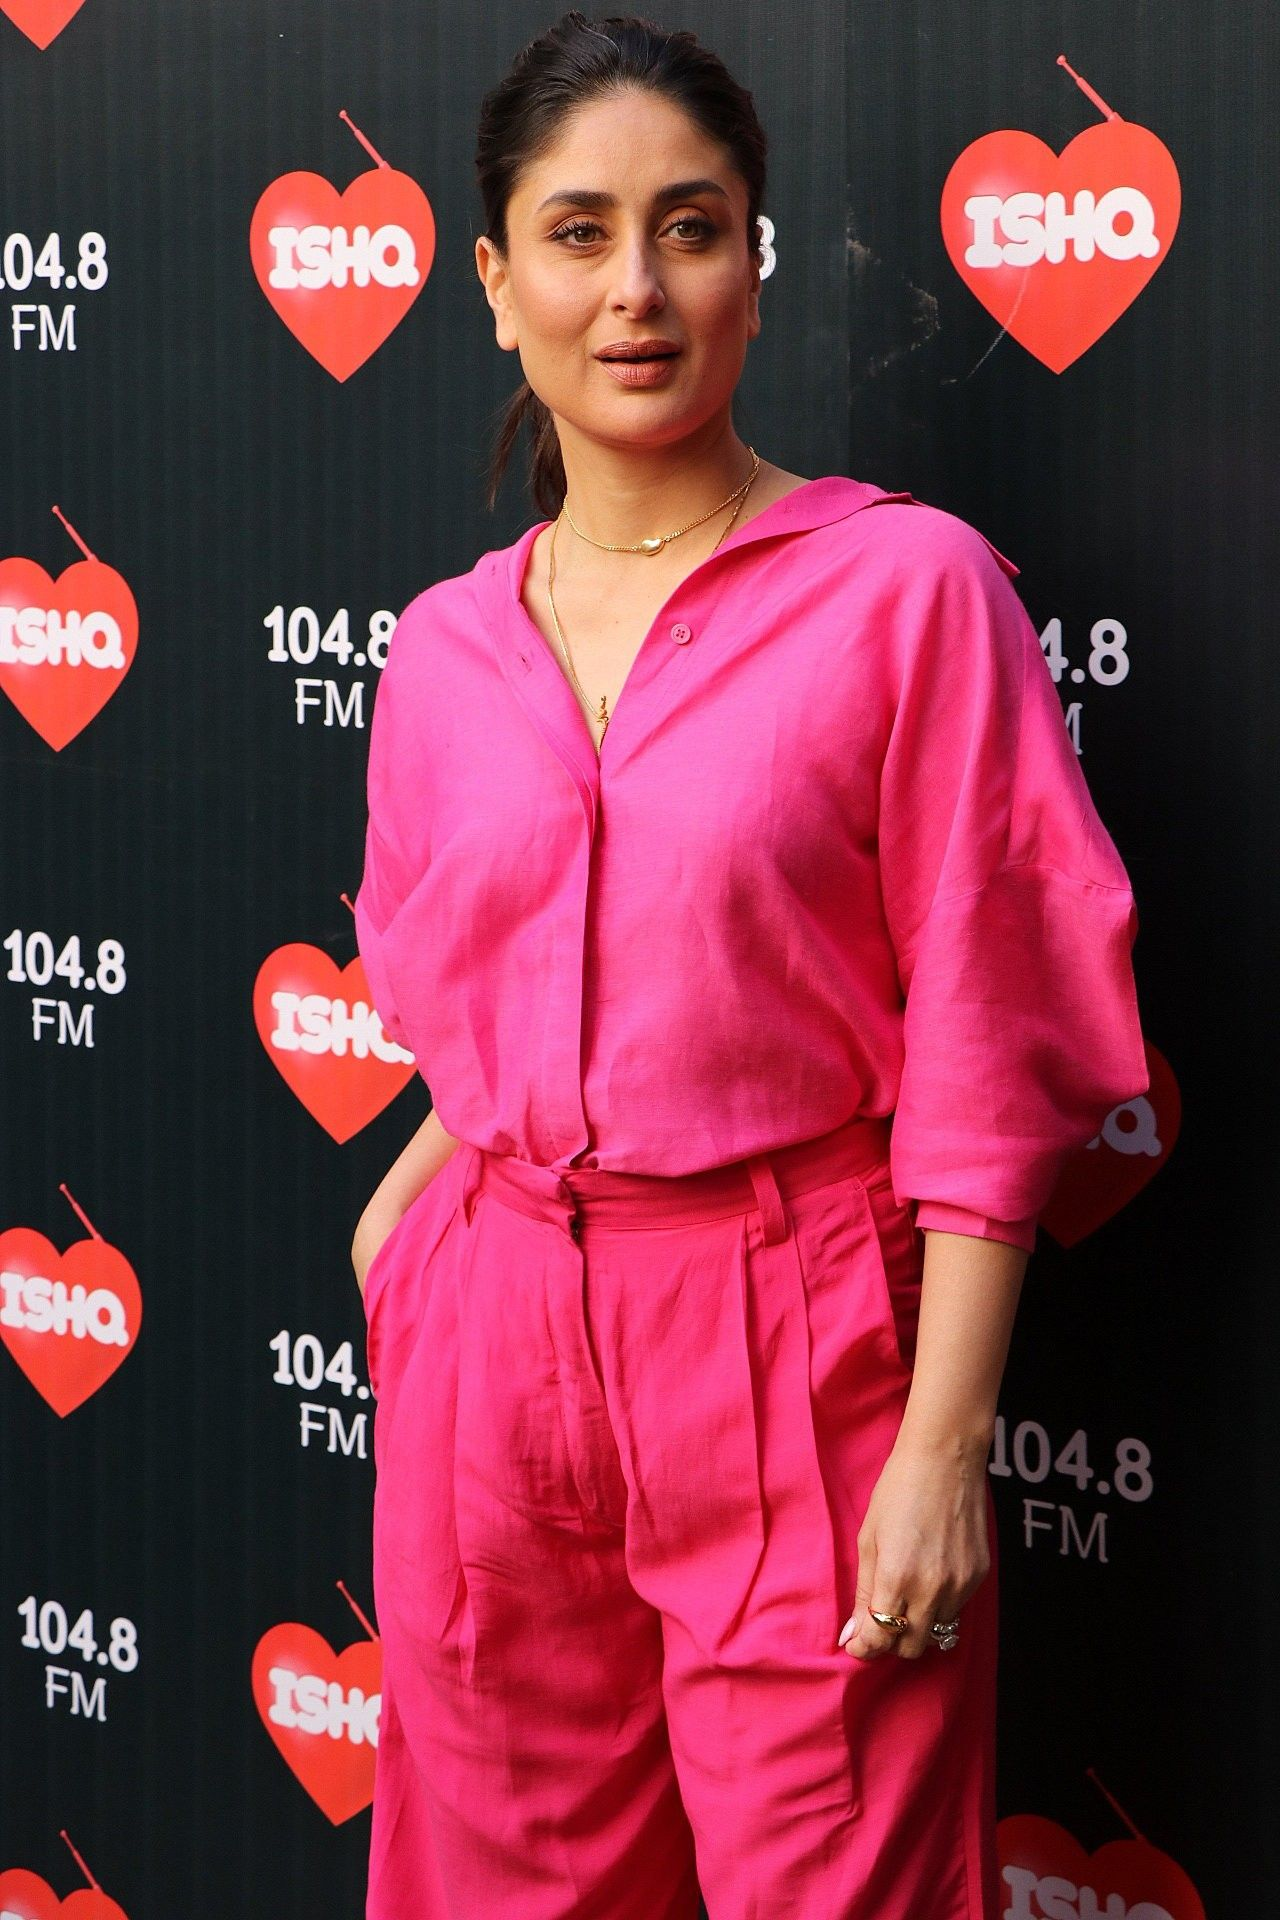 Pin By Guru Sai Charan On Kareena The Bebo Kareena Kapoor Khan Fashion Kareena Kapoor